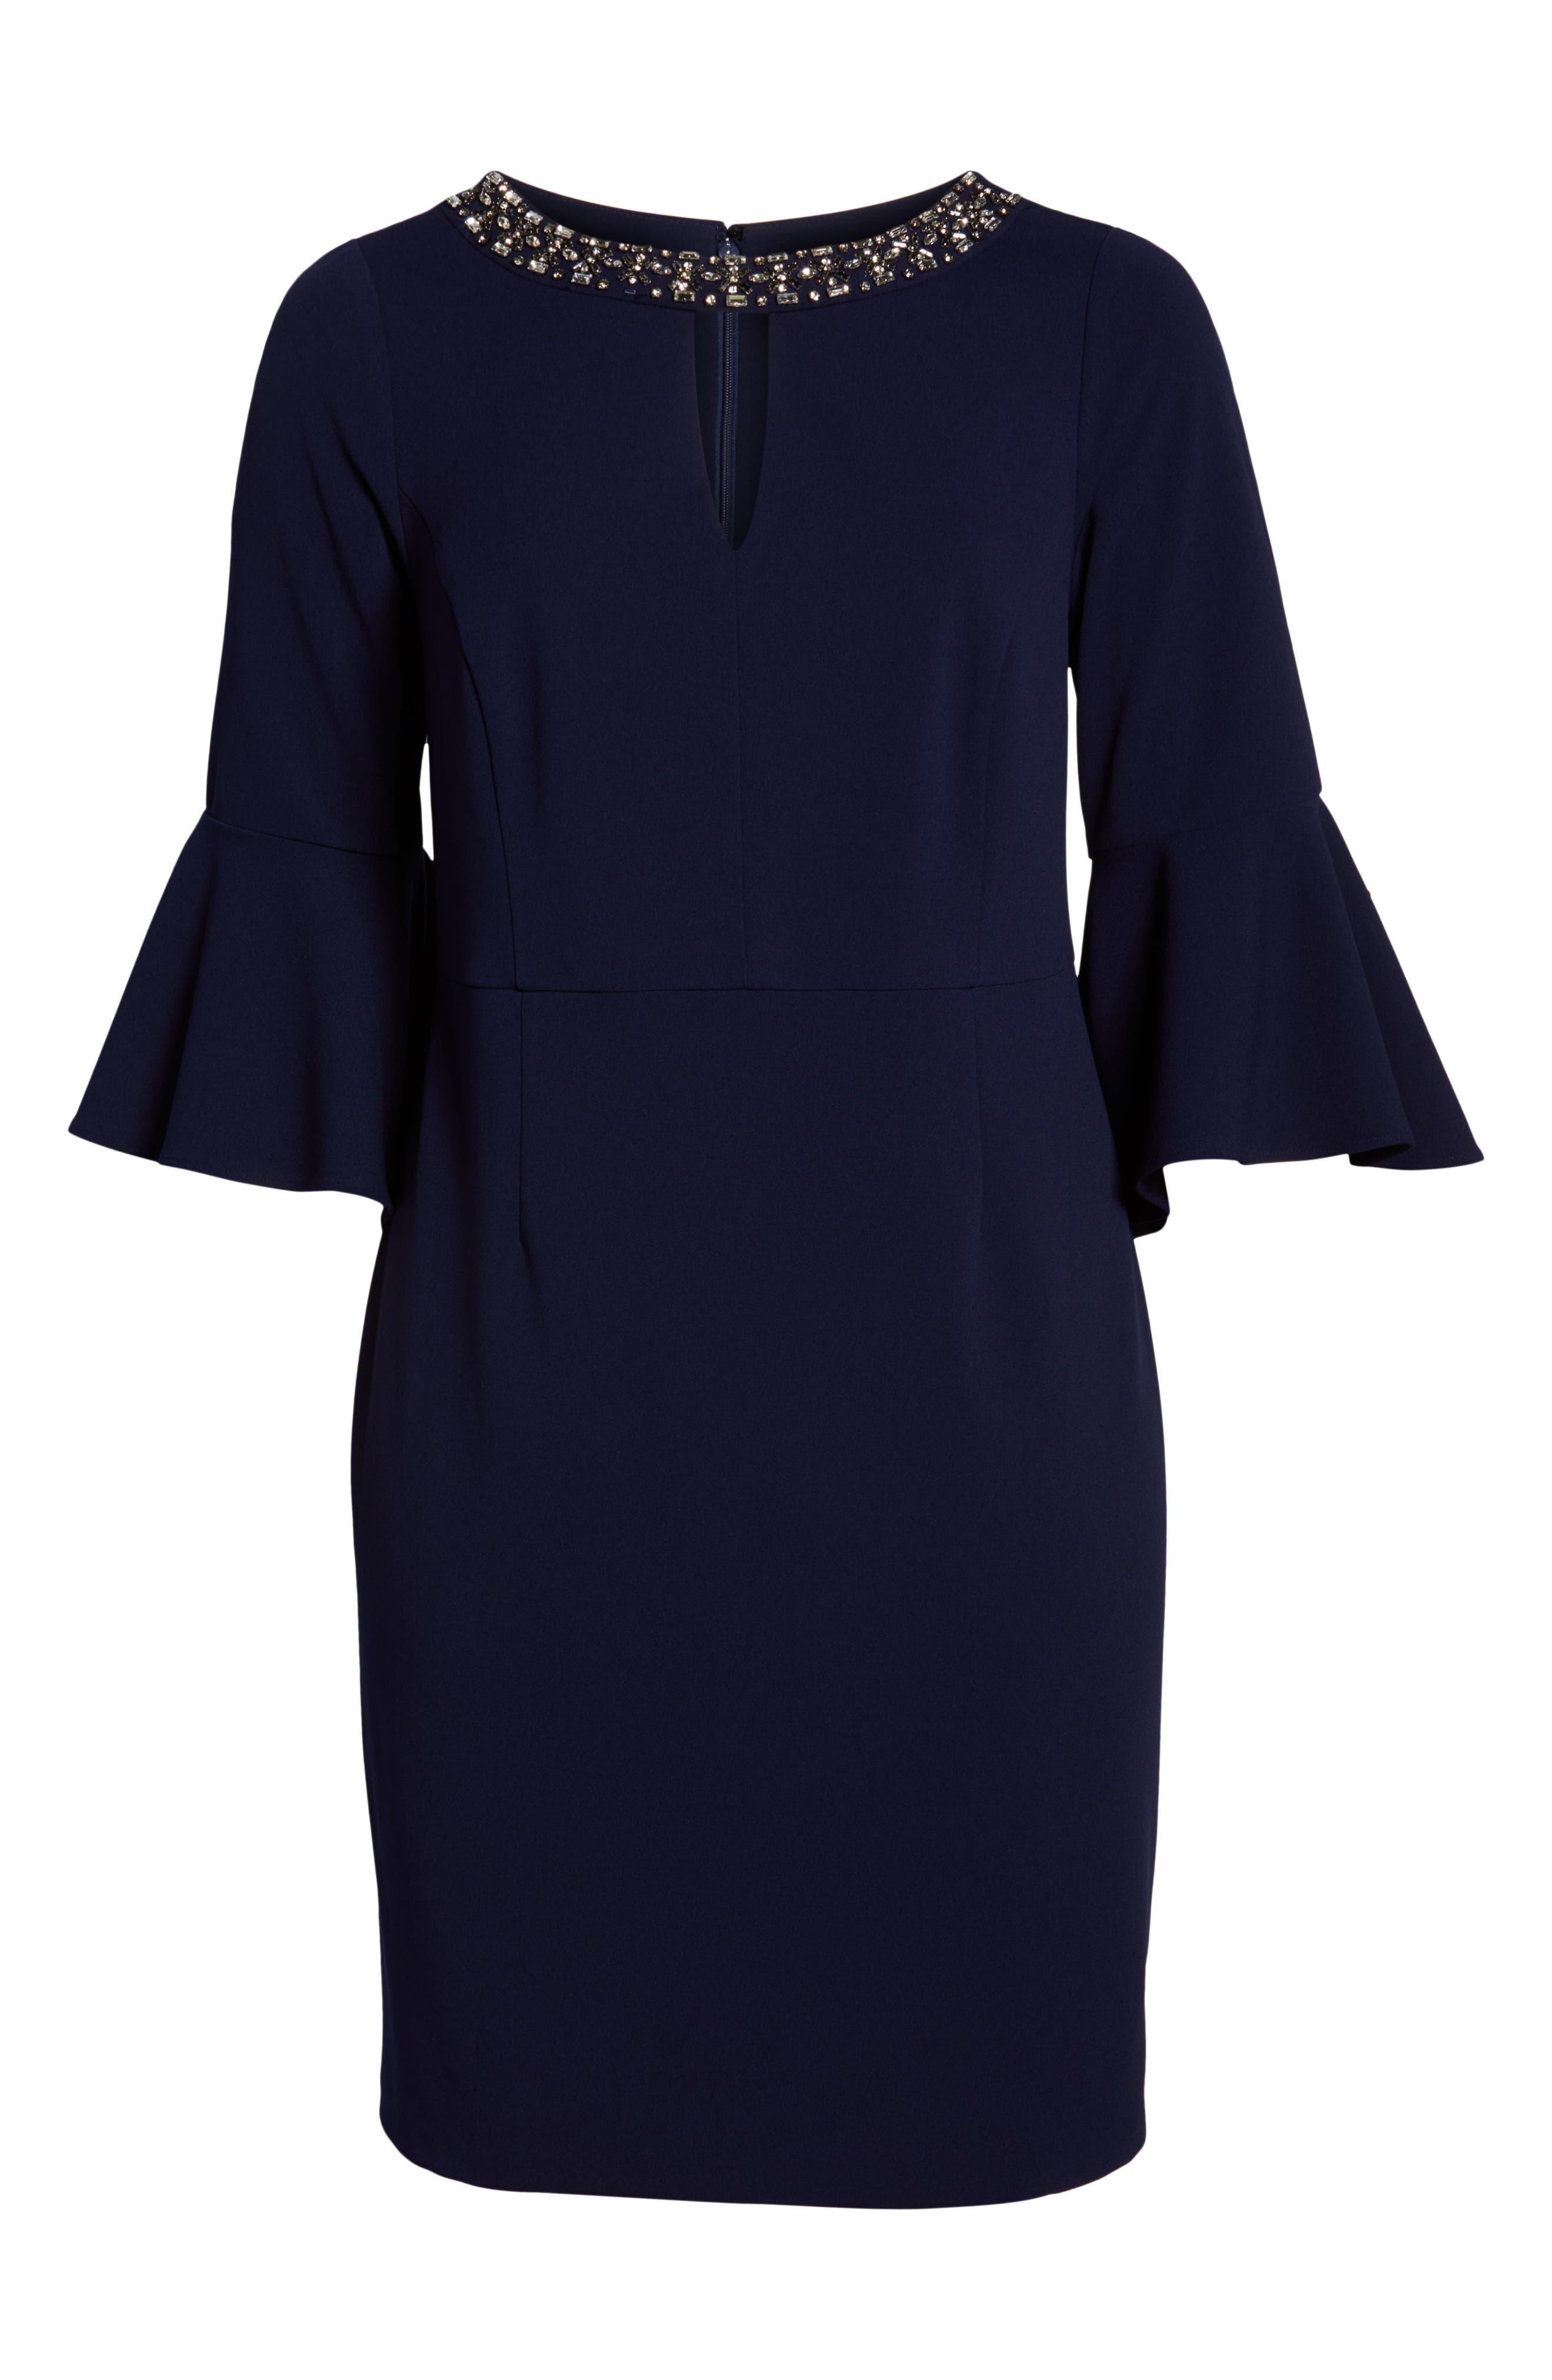 VINCE CAMUTO, Embellished Neck Sheath Dress, Alternate thumbnail 7, color, NAVY